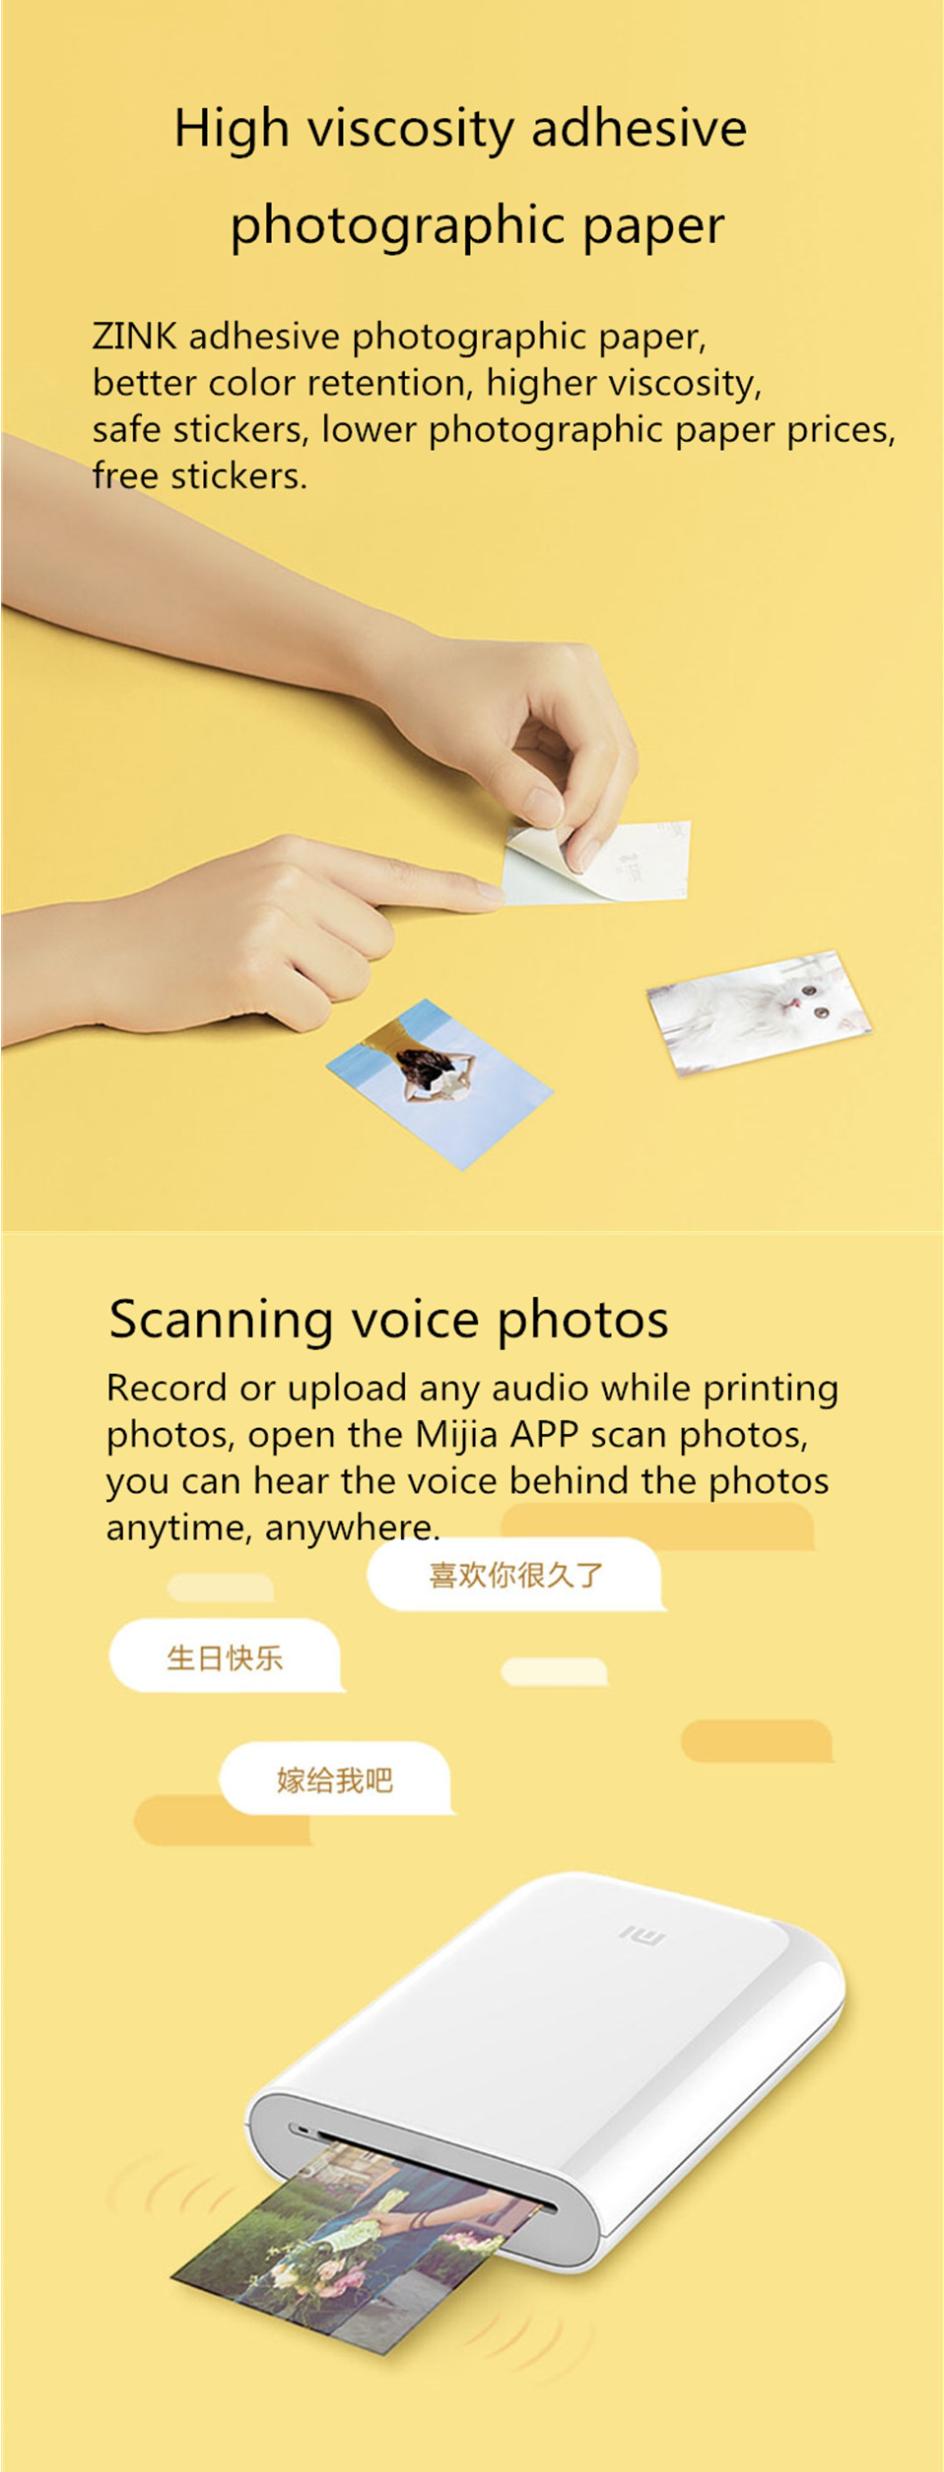 XIAOMI Pocket Photo Printer 3 Inch 300dpi AR ZINK Non-ink Mini Picture Printer bluetooth Connection 11